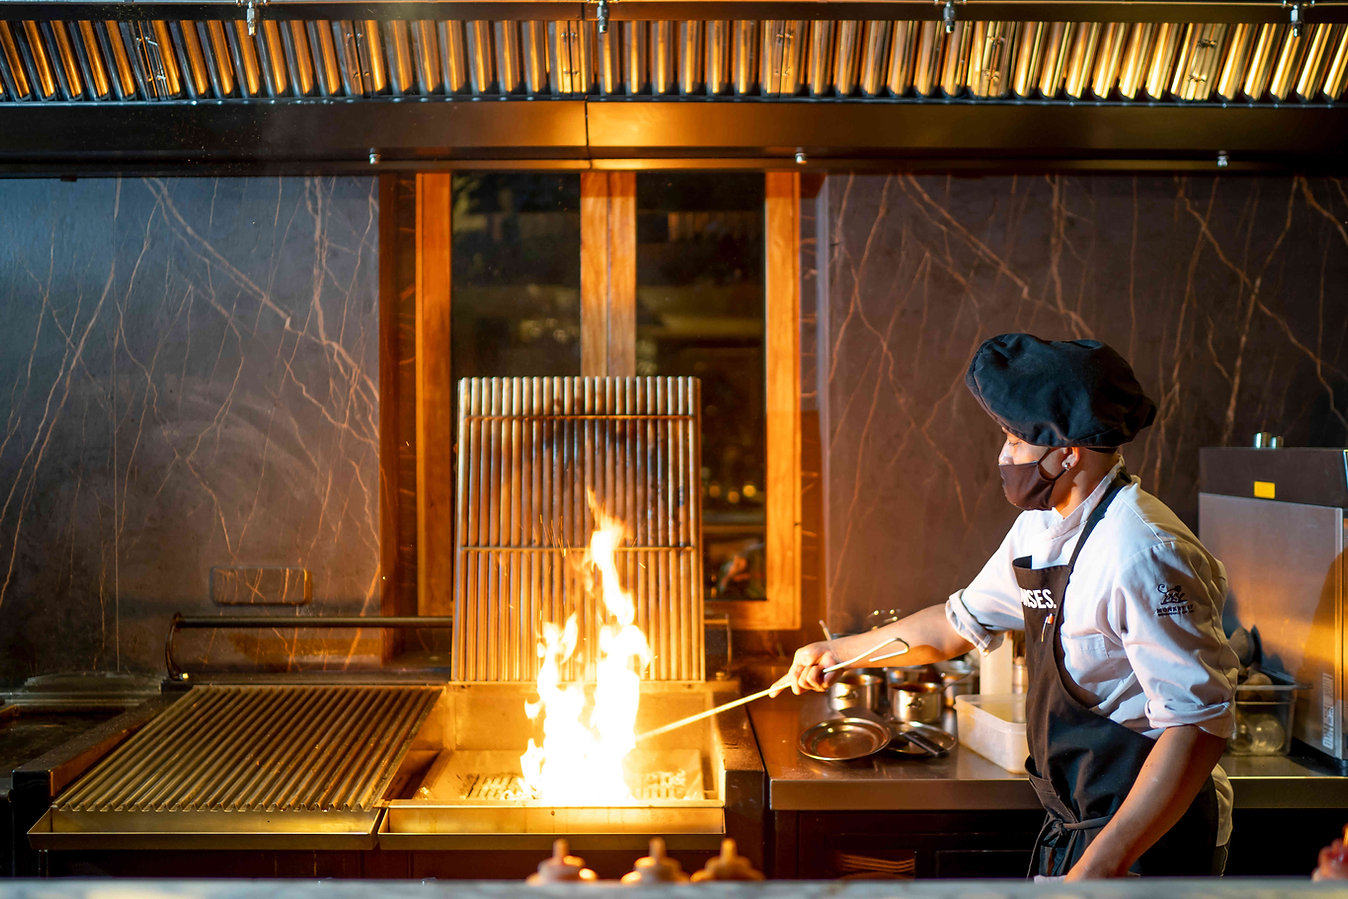 Kitchen Ramses apertura (Restaurantes) - GastroMadrid